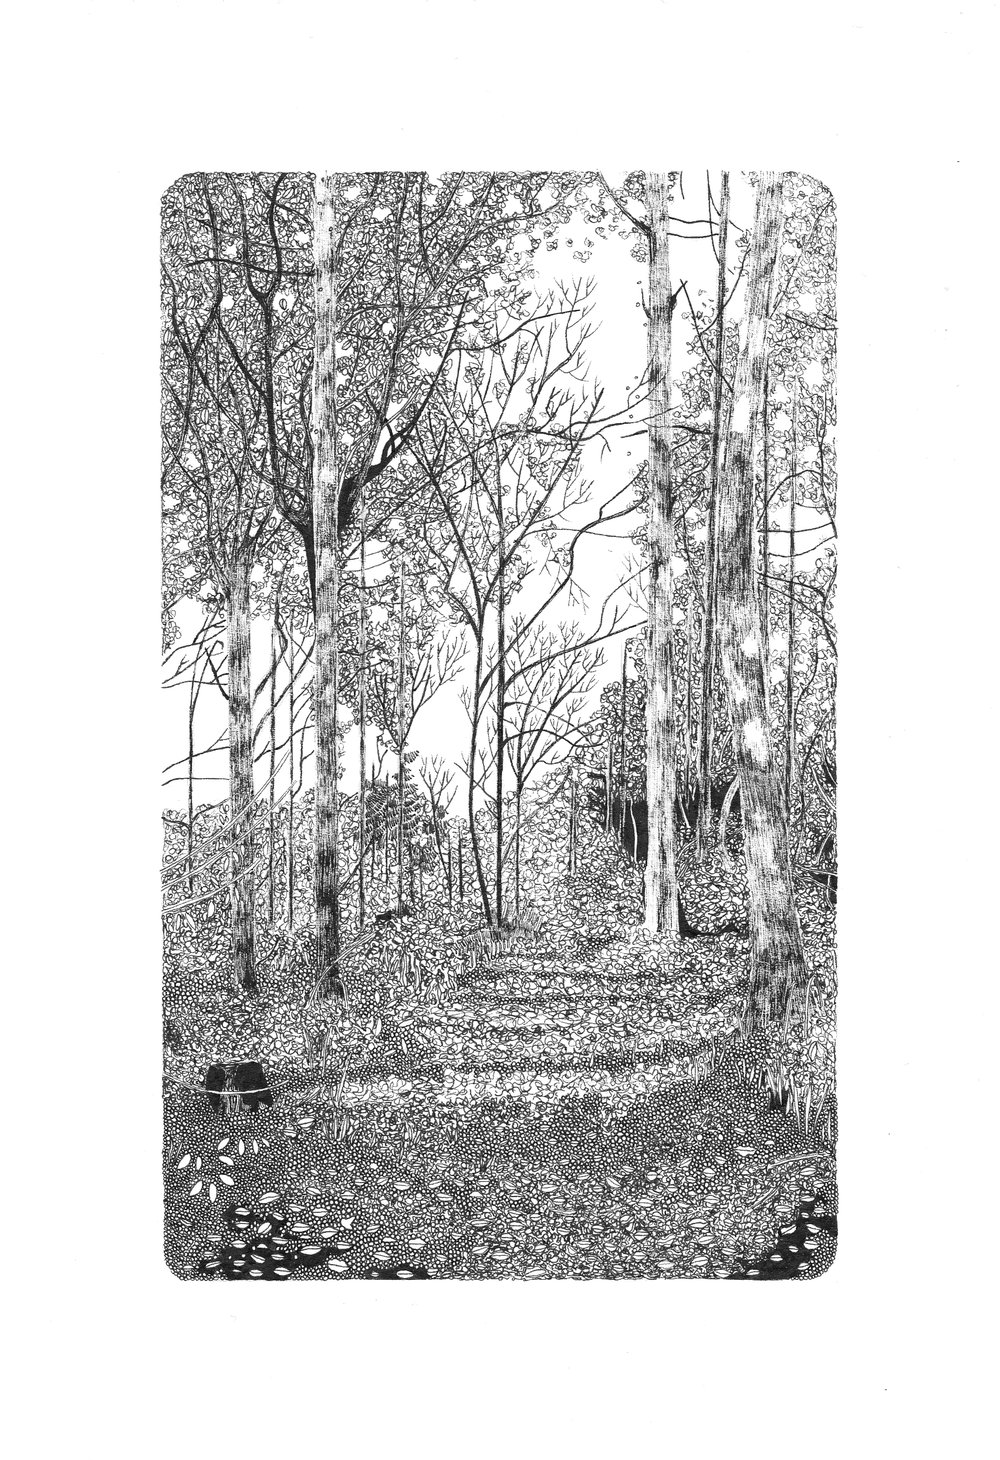 Claire+Leach+-+Woodland+Study+IV.jpg